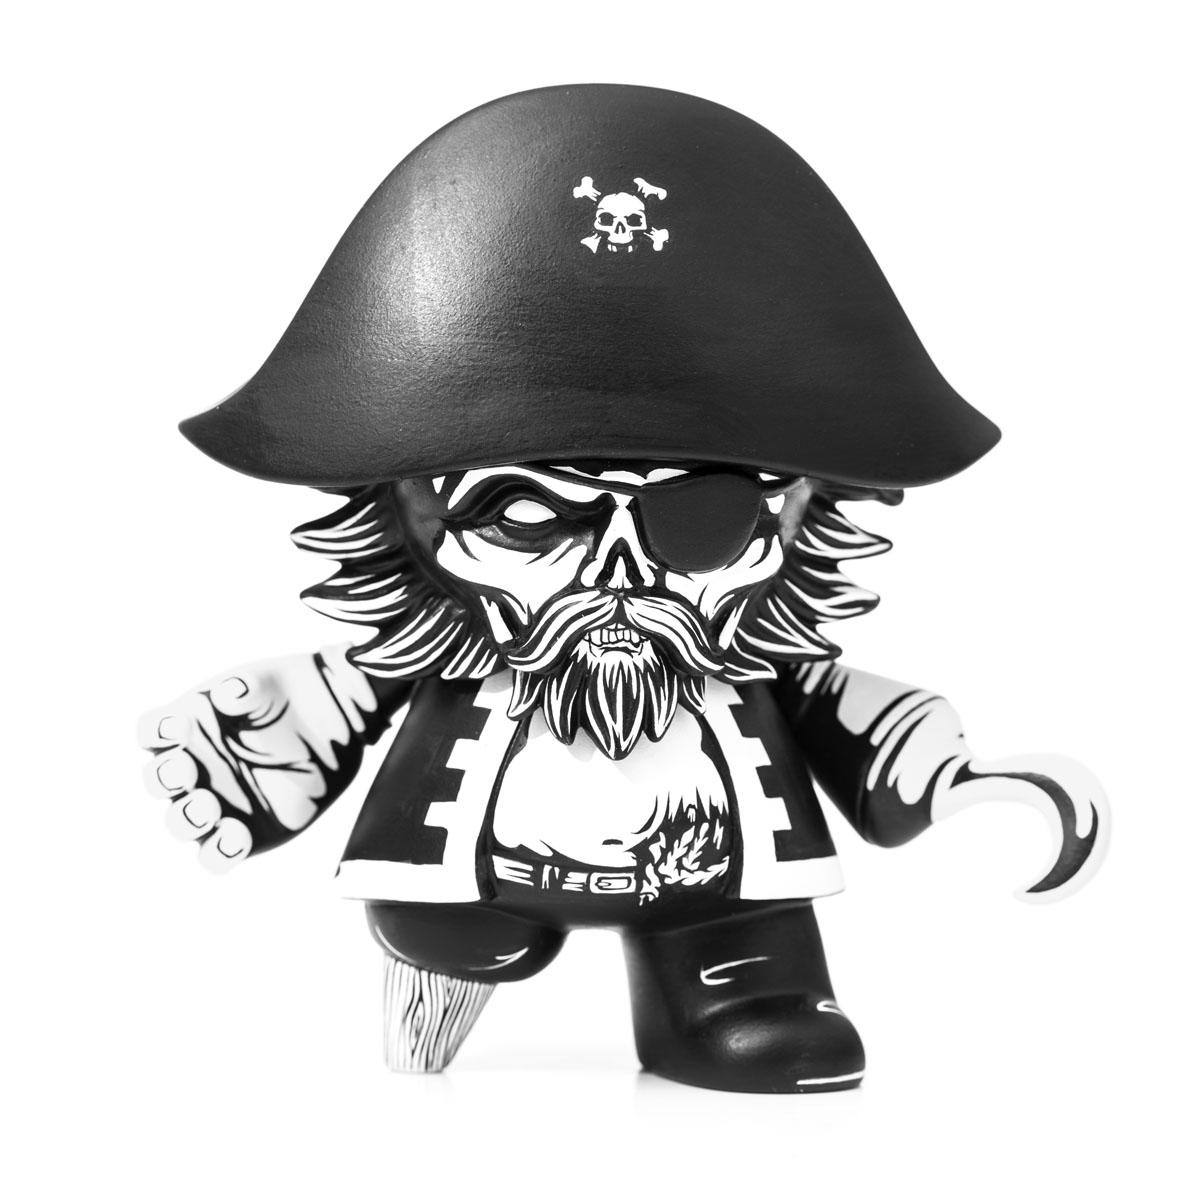 JonPaul Kaiser - Captain Sturnbrau zombie 2